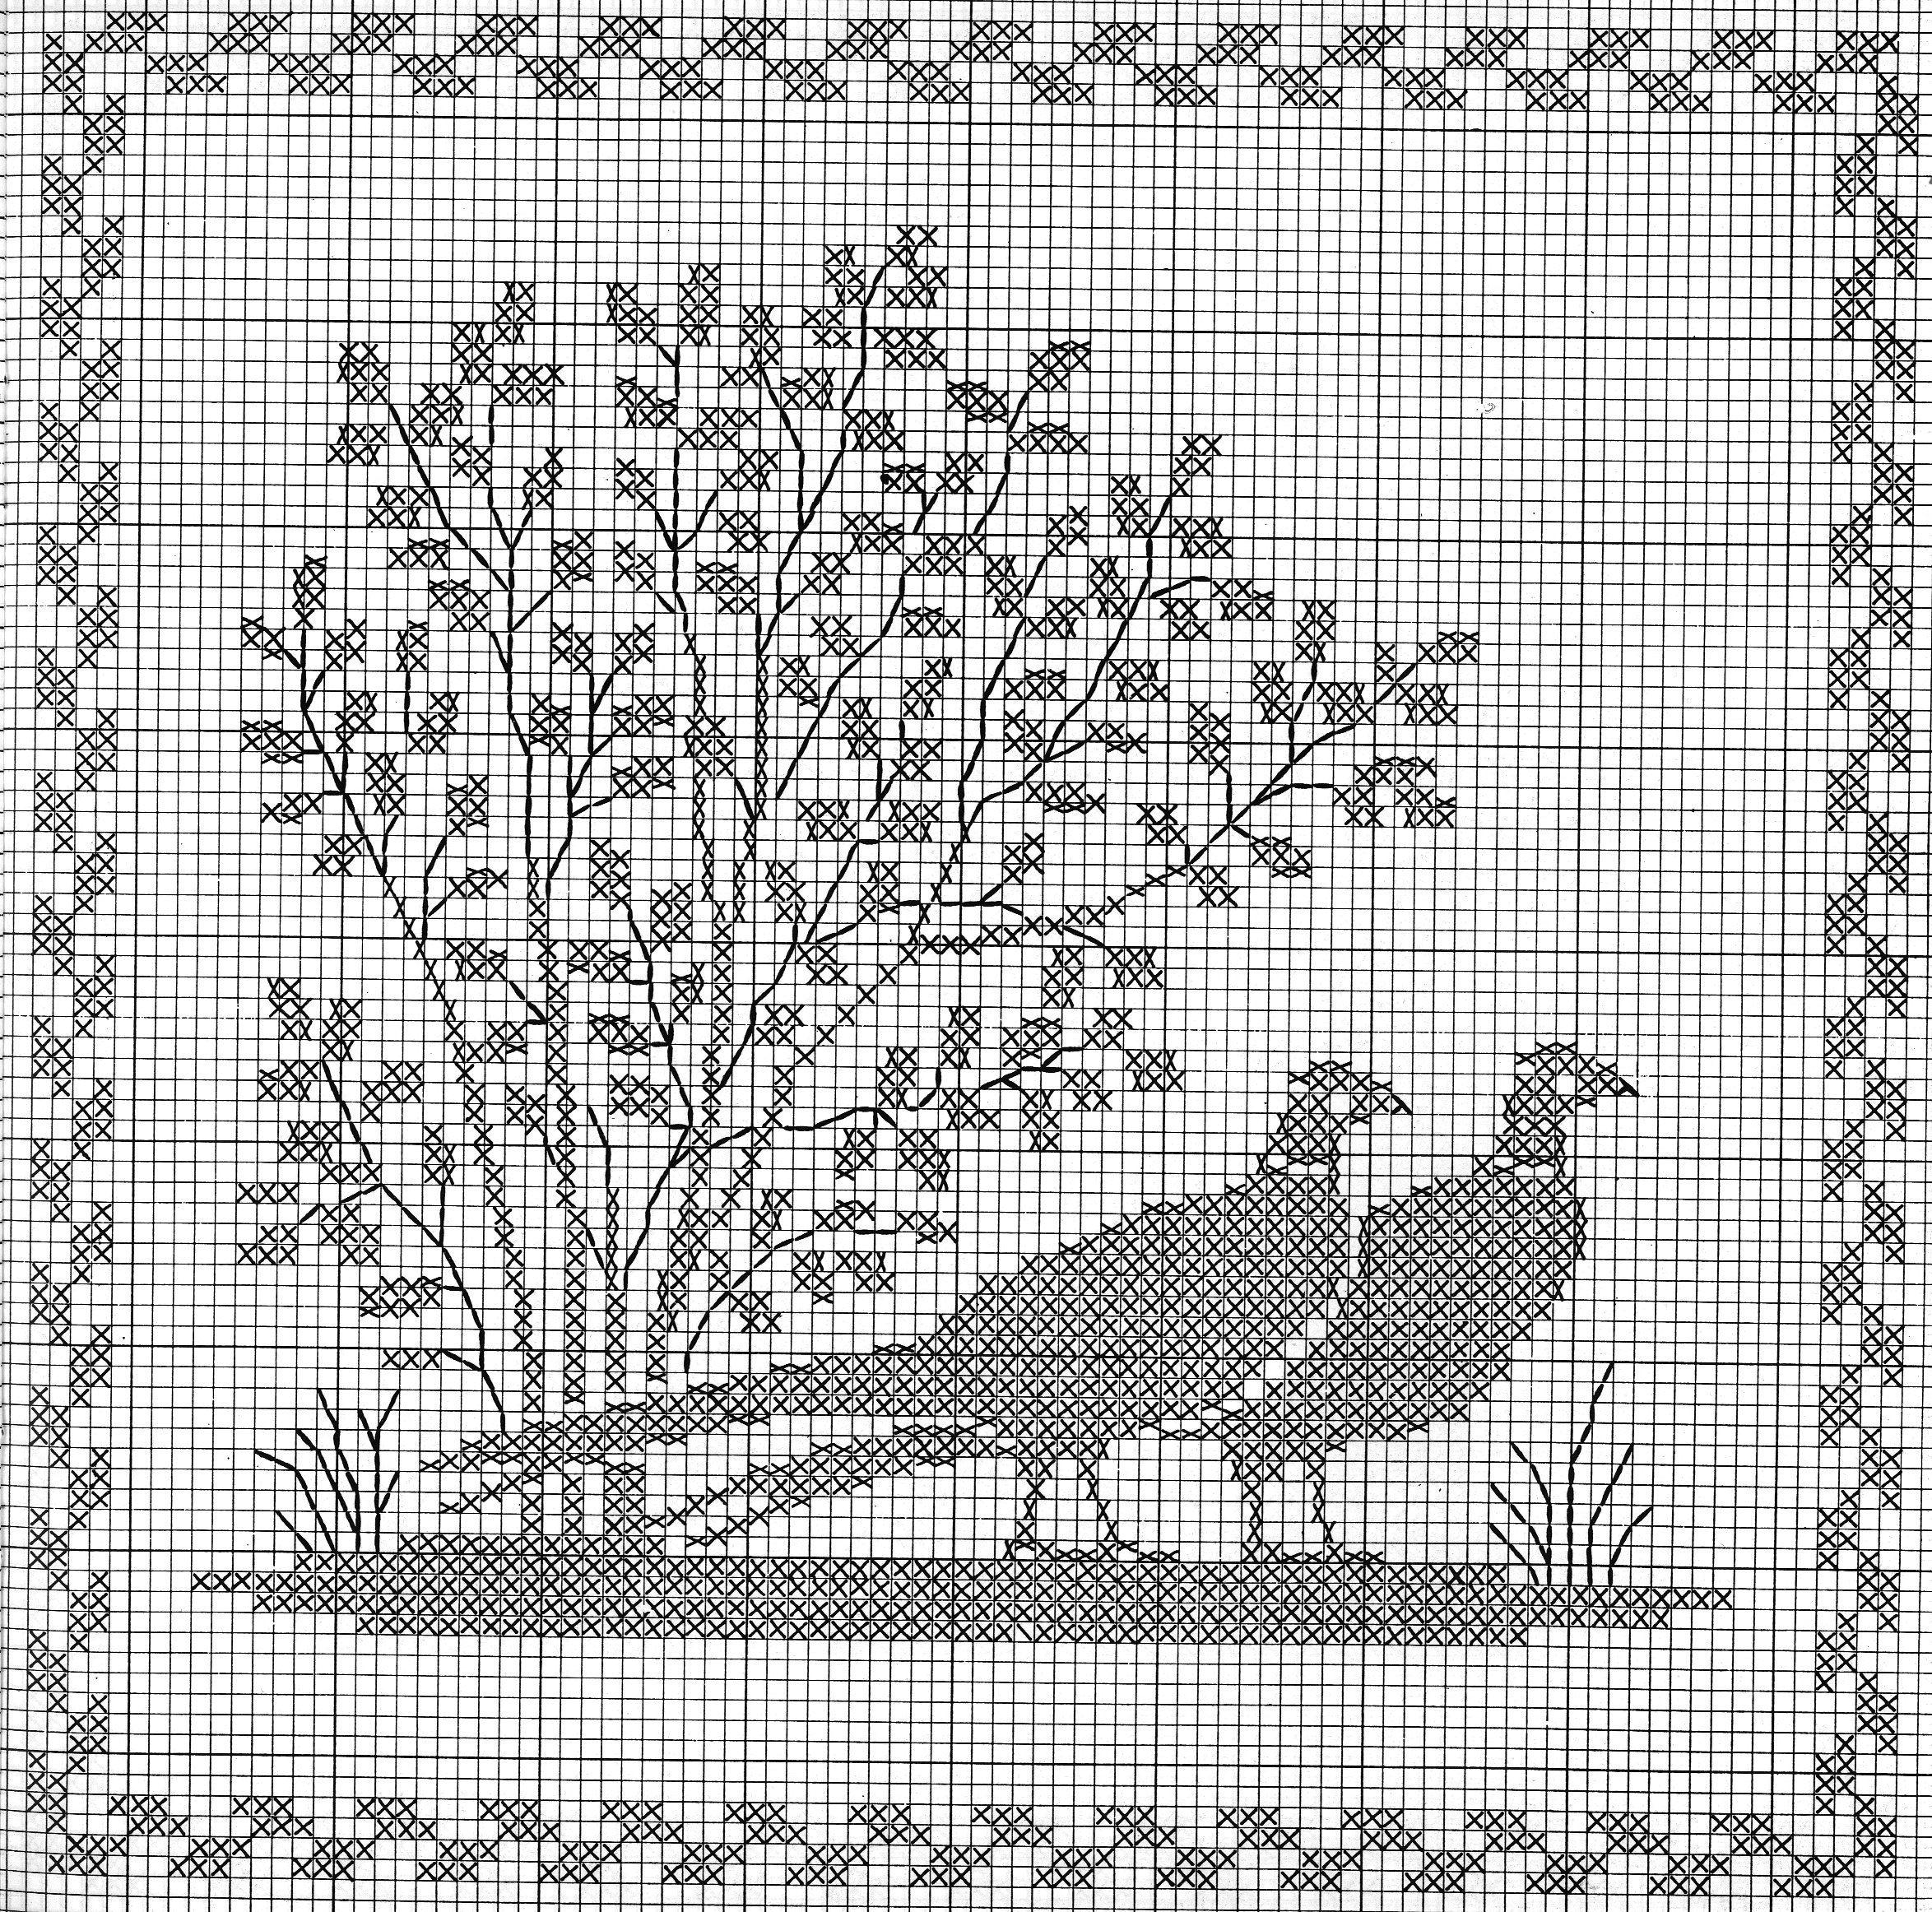 mosca.gallery.ru watch?ph=p1E-djJ4w&subpanel=zoom&zoom=8 | crochet ...